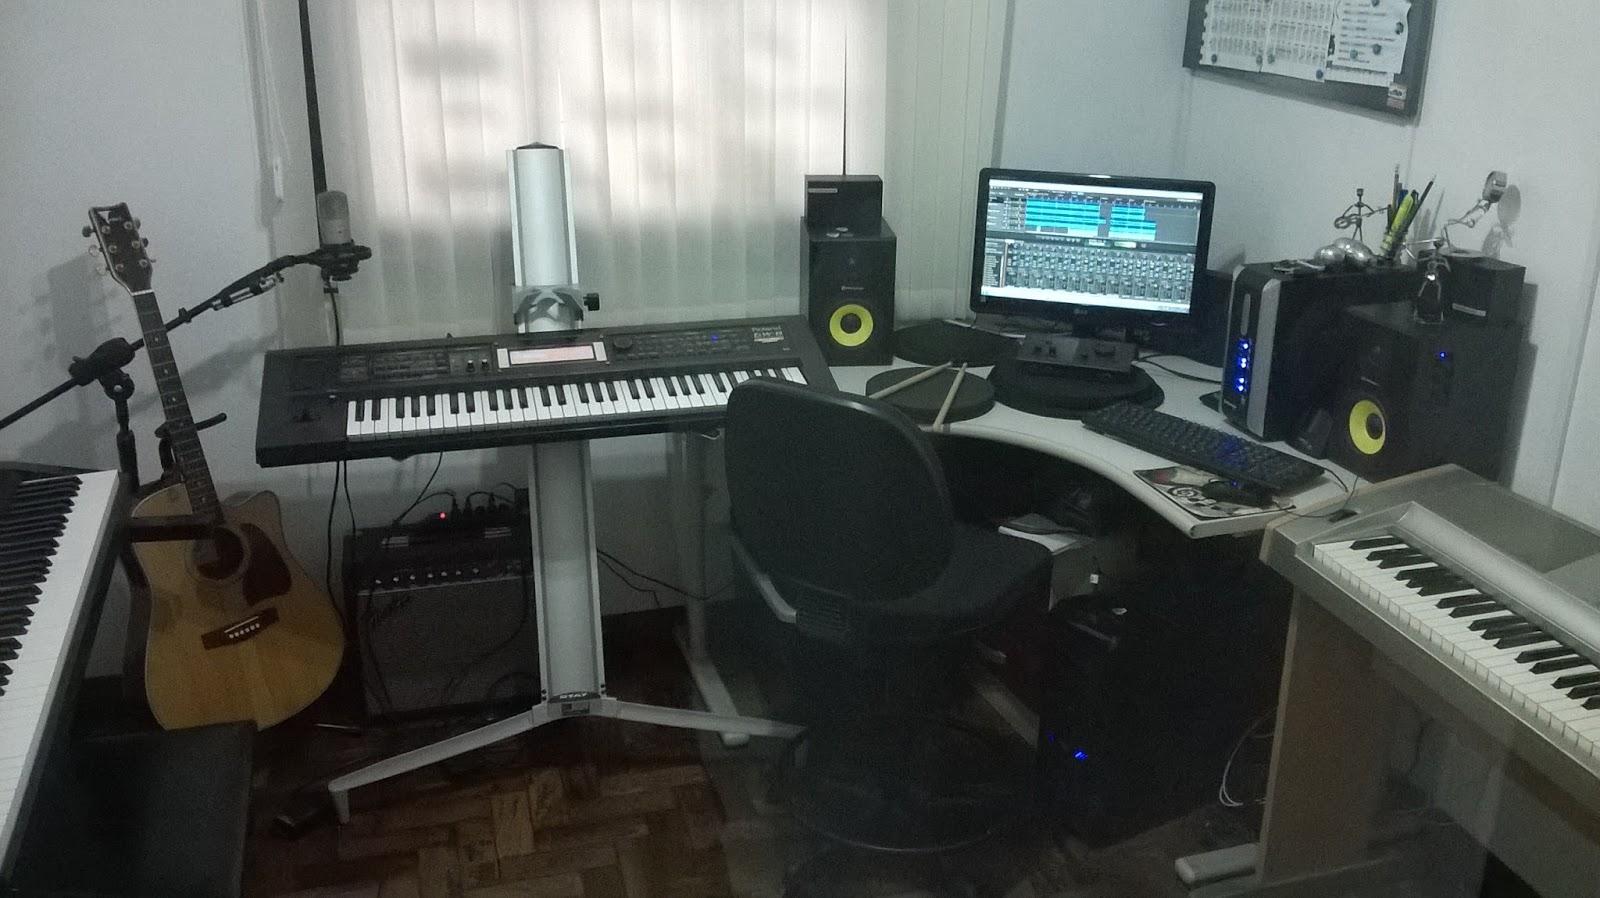 centro cultural cantares studio cantares. Black Bedroom Furniture Sets. Home Design Ideas